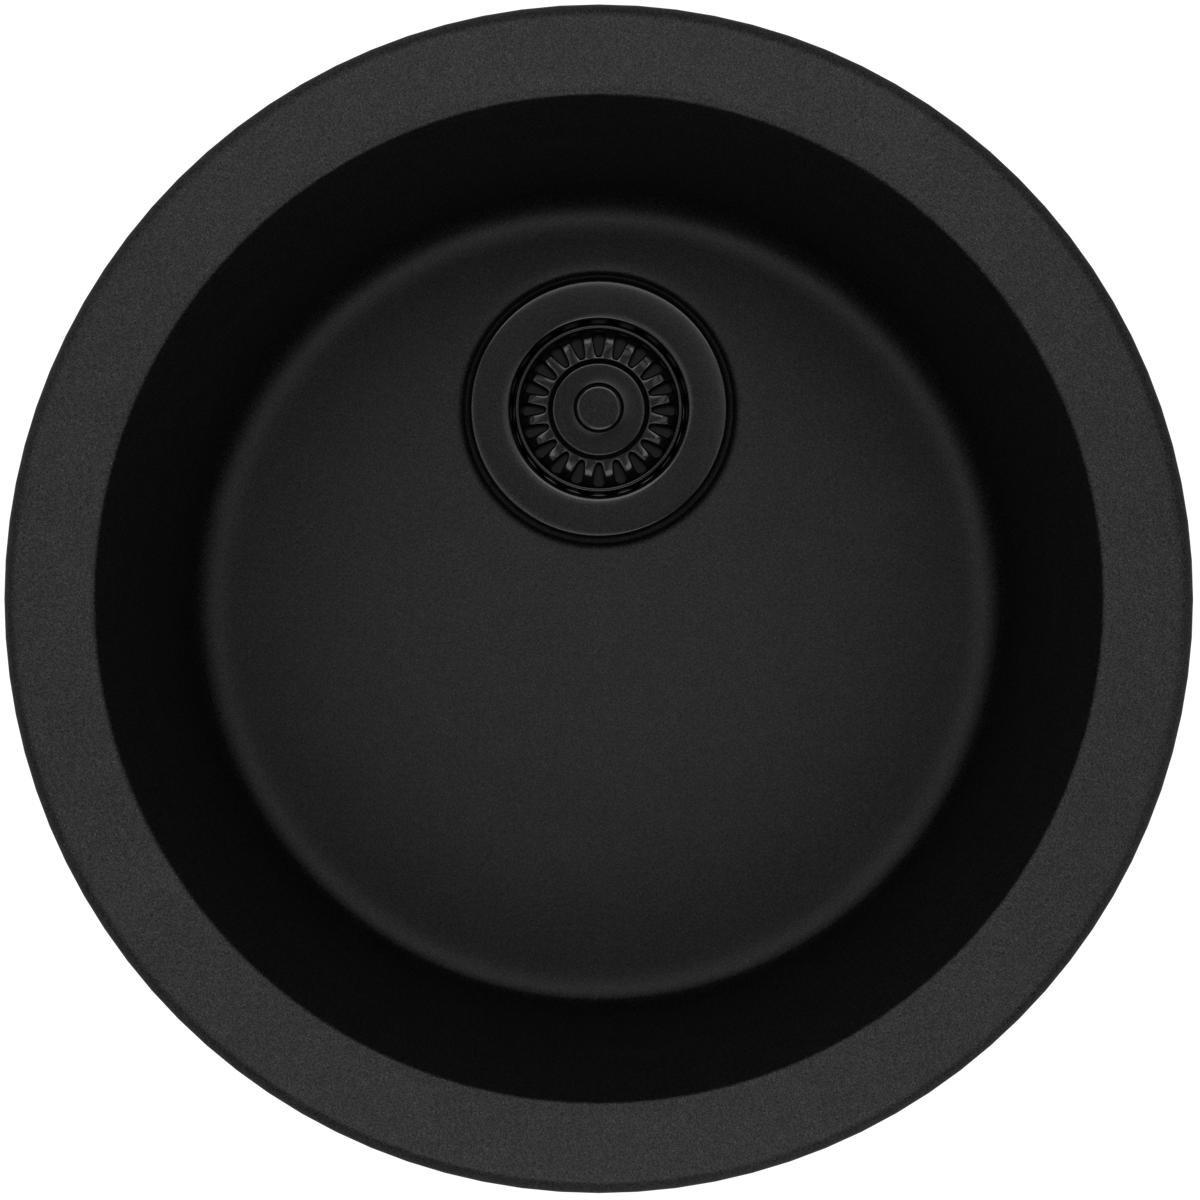 Elkay Quartz Classic ELG16FBBK0 Black Single Bowl Dual Mount Bar Sink